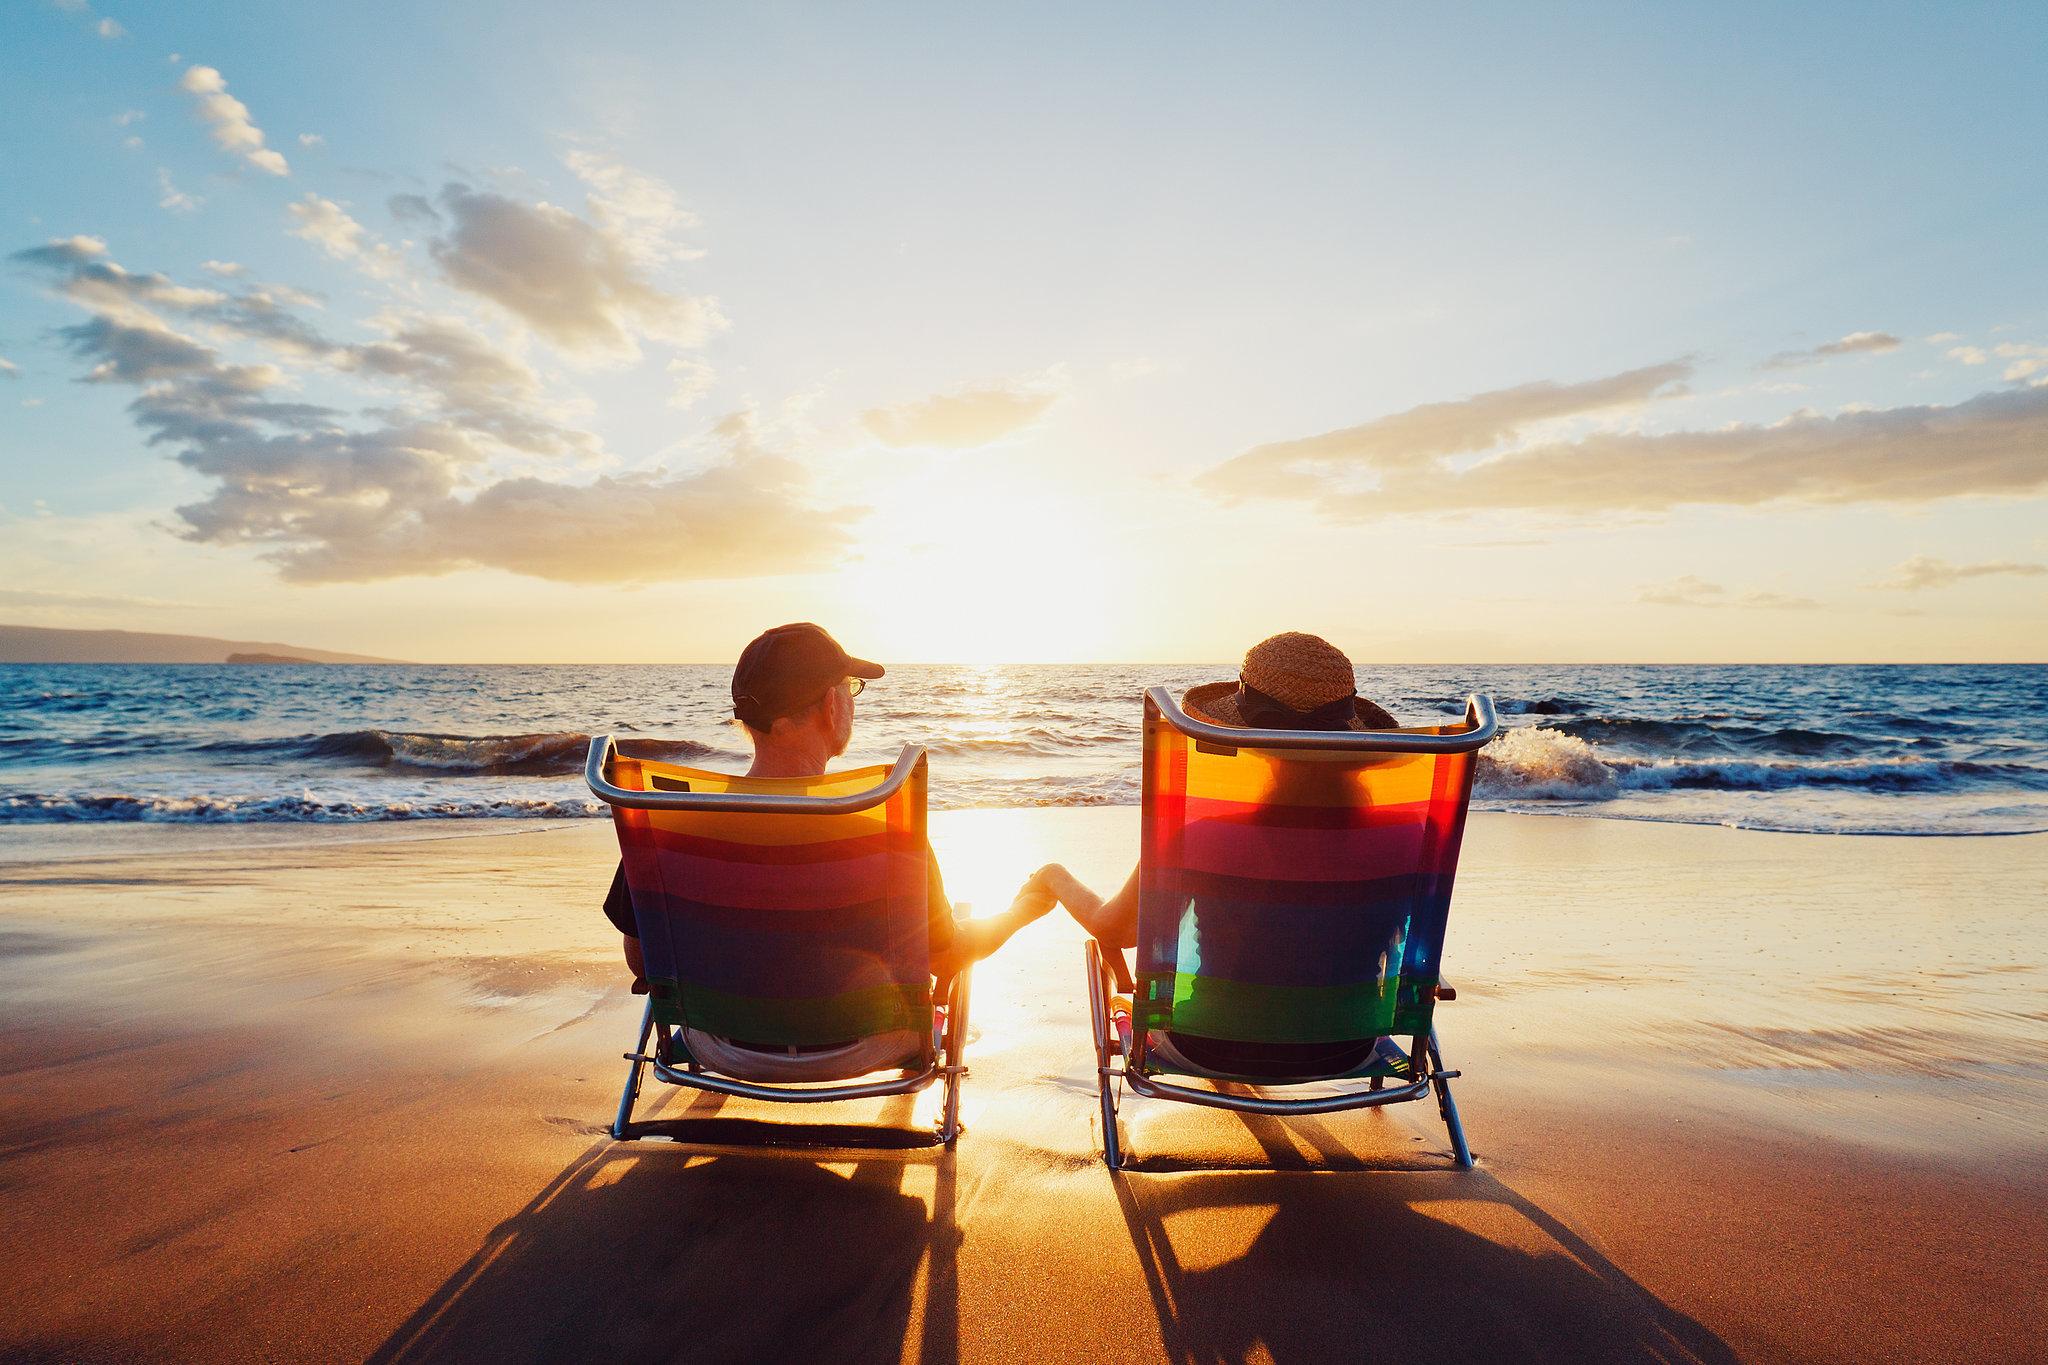 retired on beach